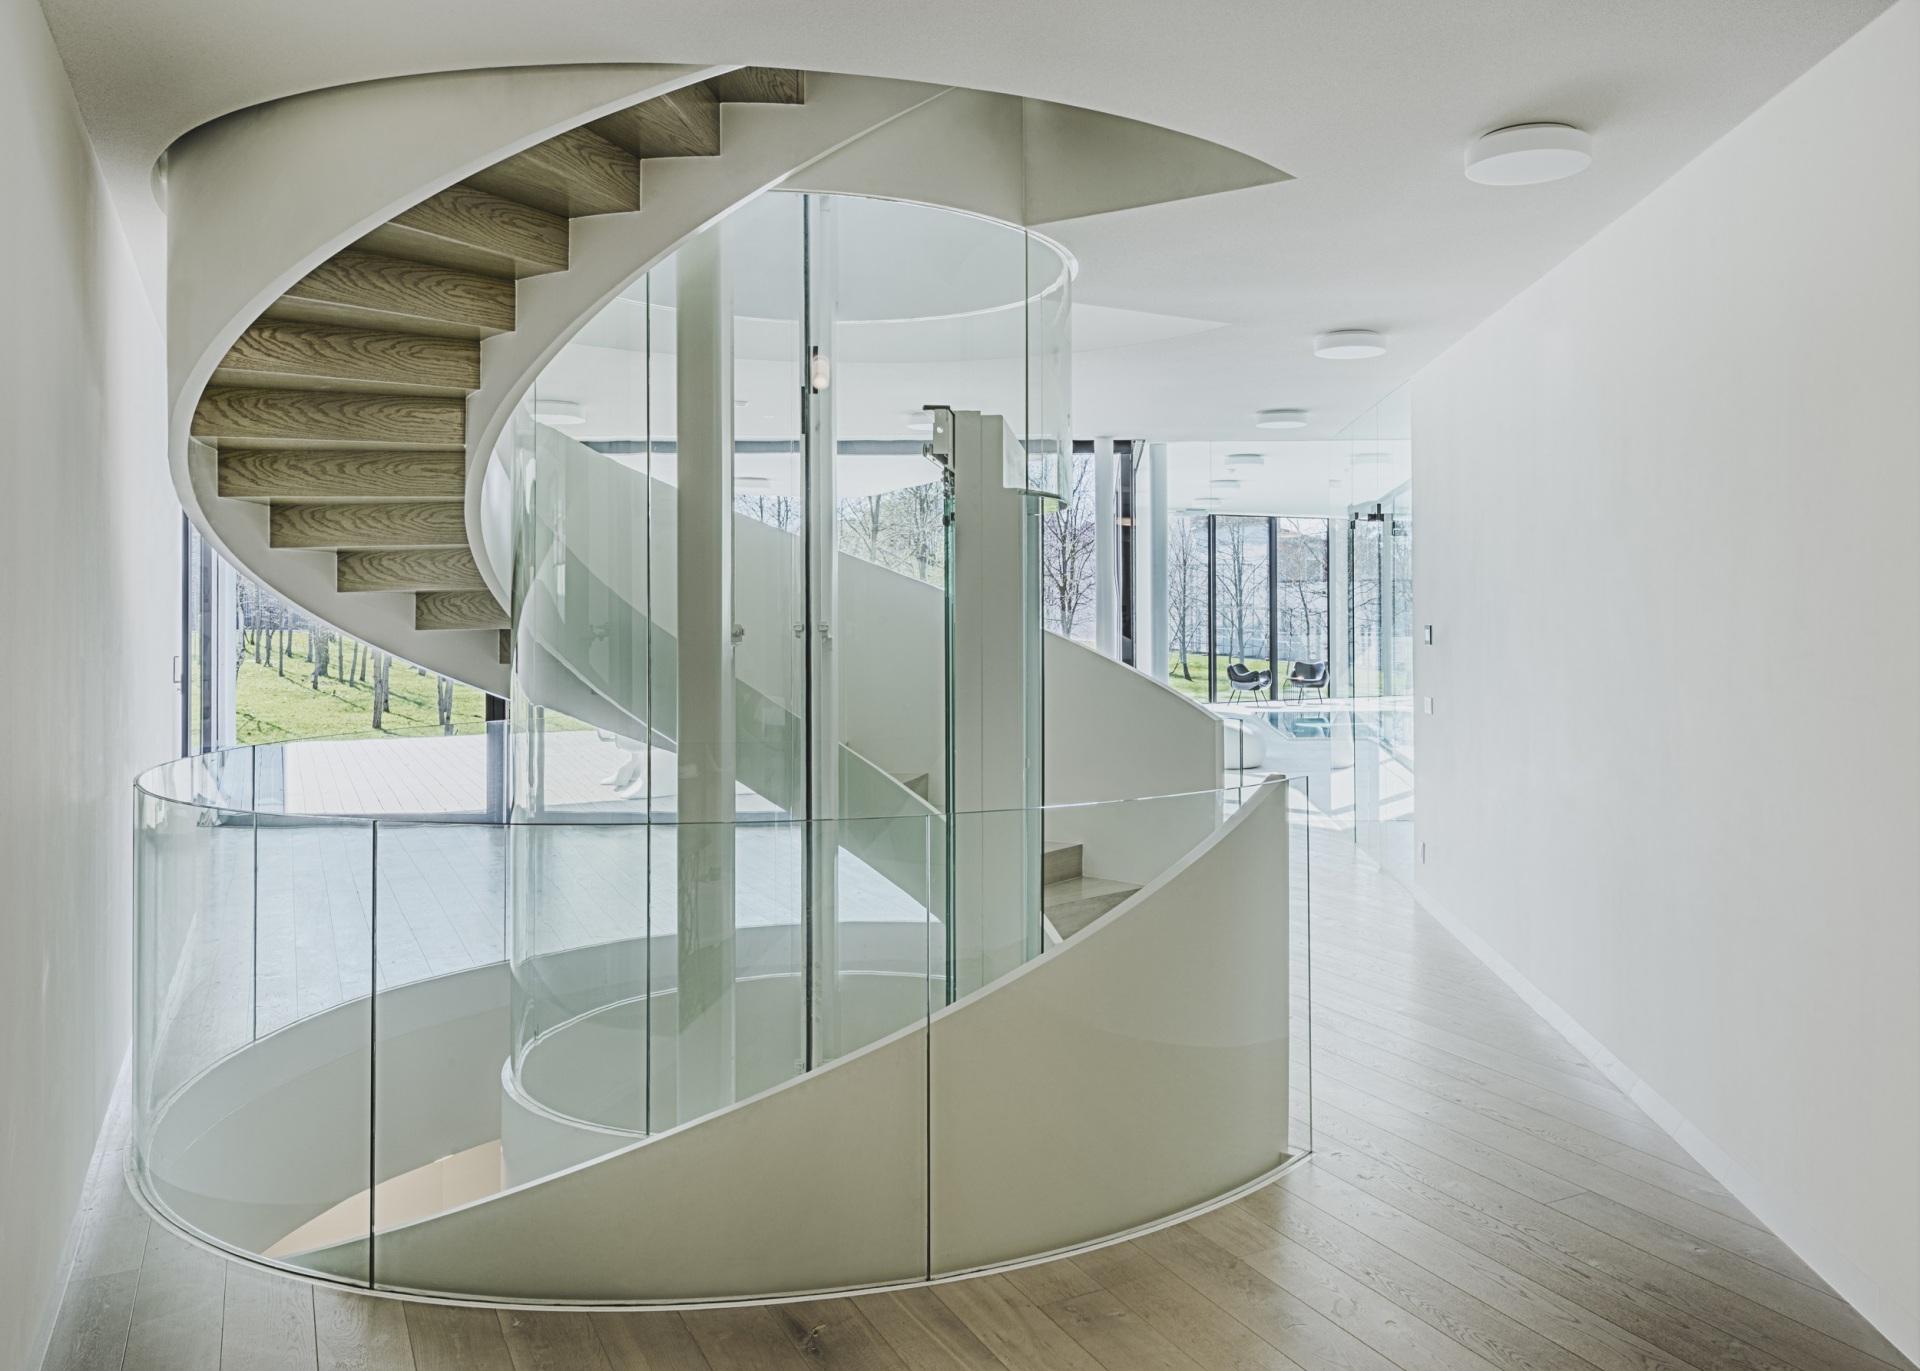 v_house_archistudio_designalive-11